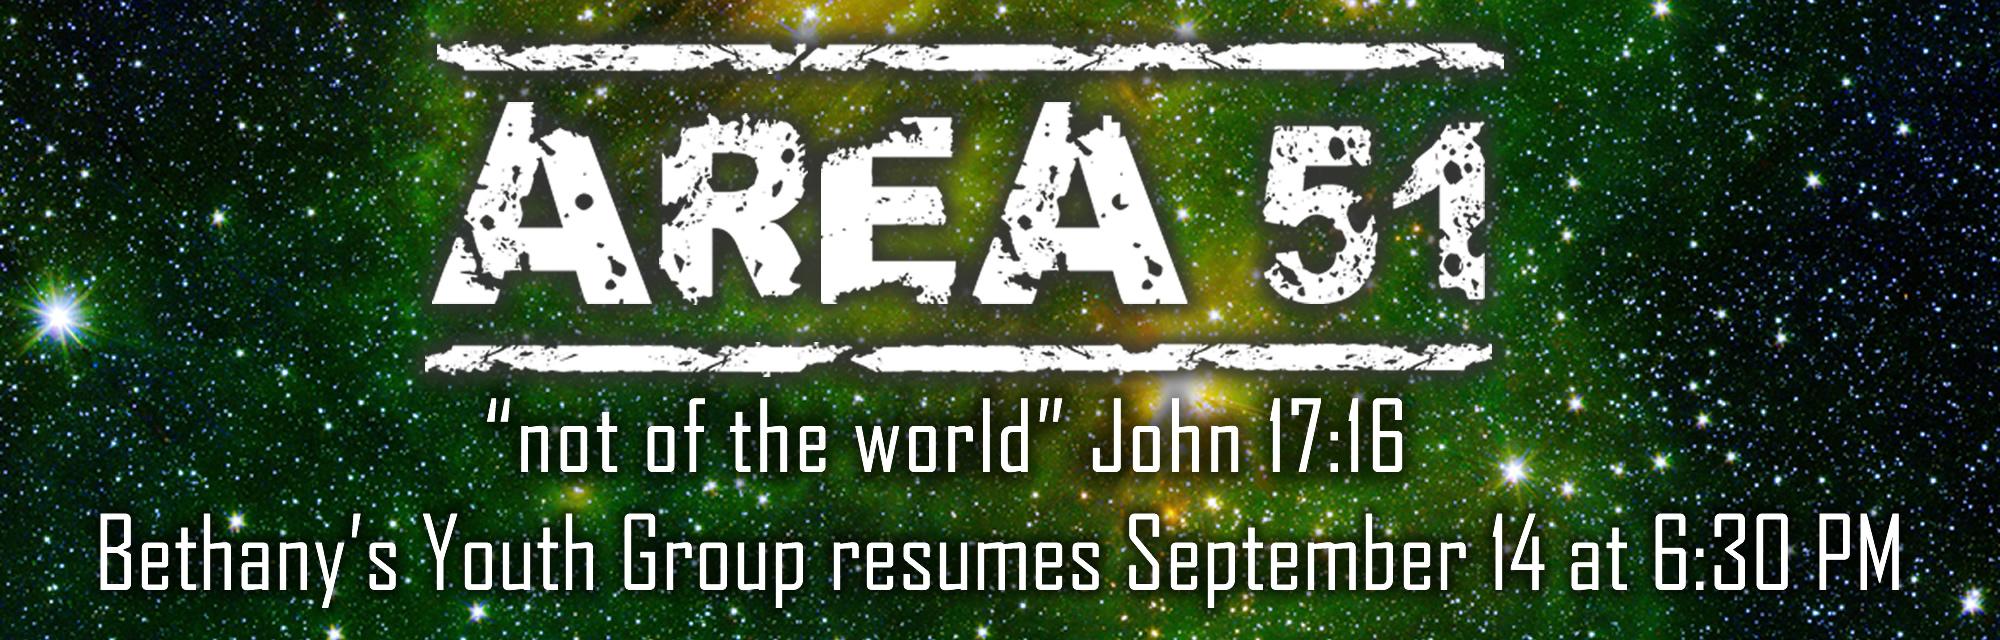 AREA 51 Resumes